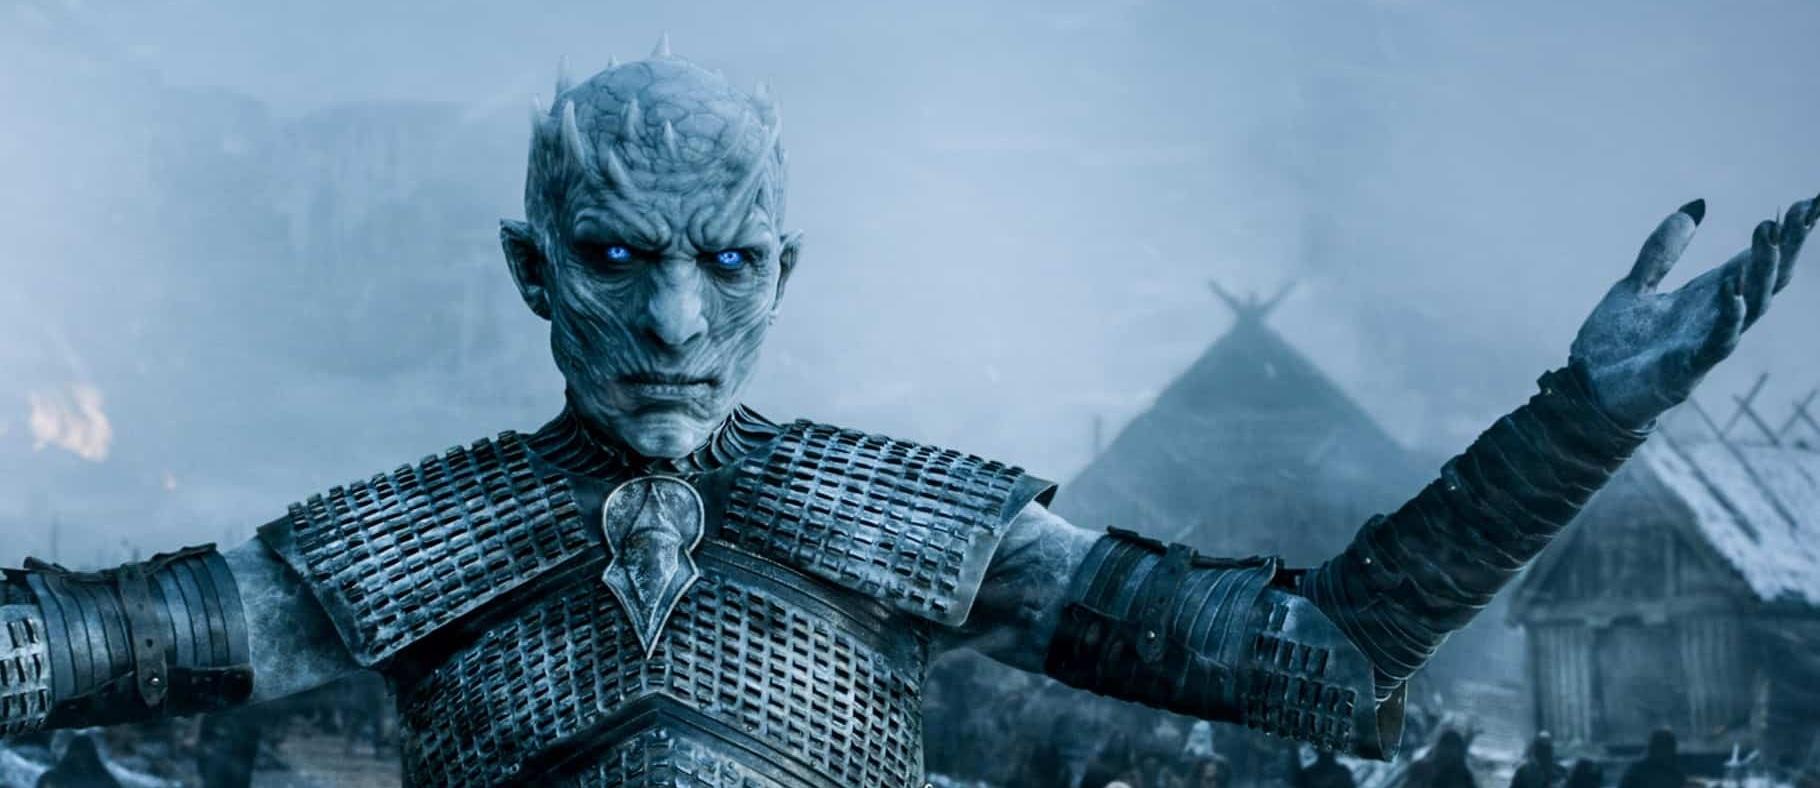 Game of Thrones   (2011-2019) avec Kit Harington, Emilia Clarke, Sophie Turner, Peter Dinklage…